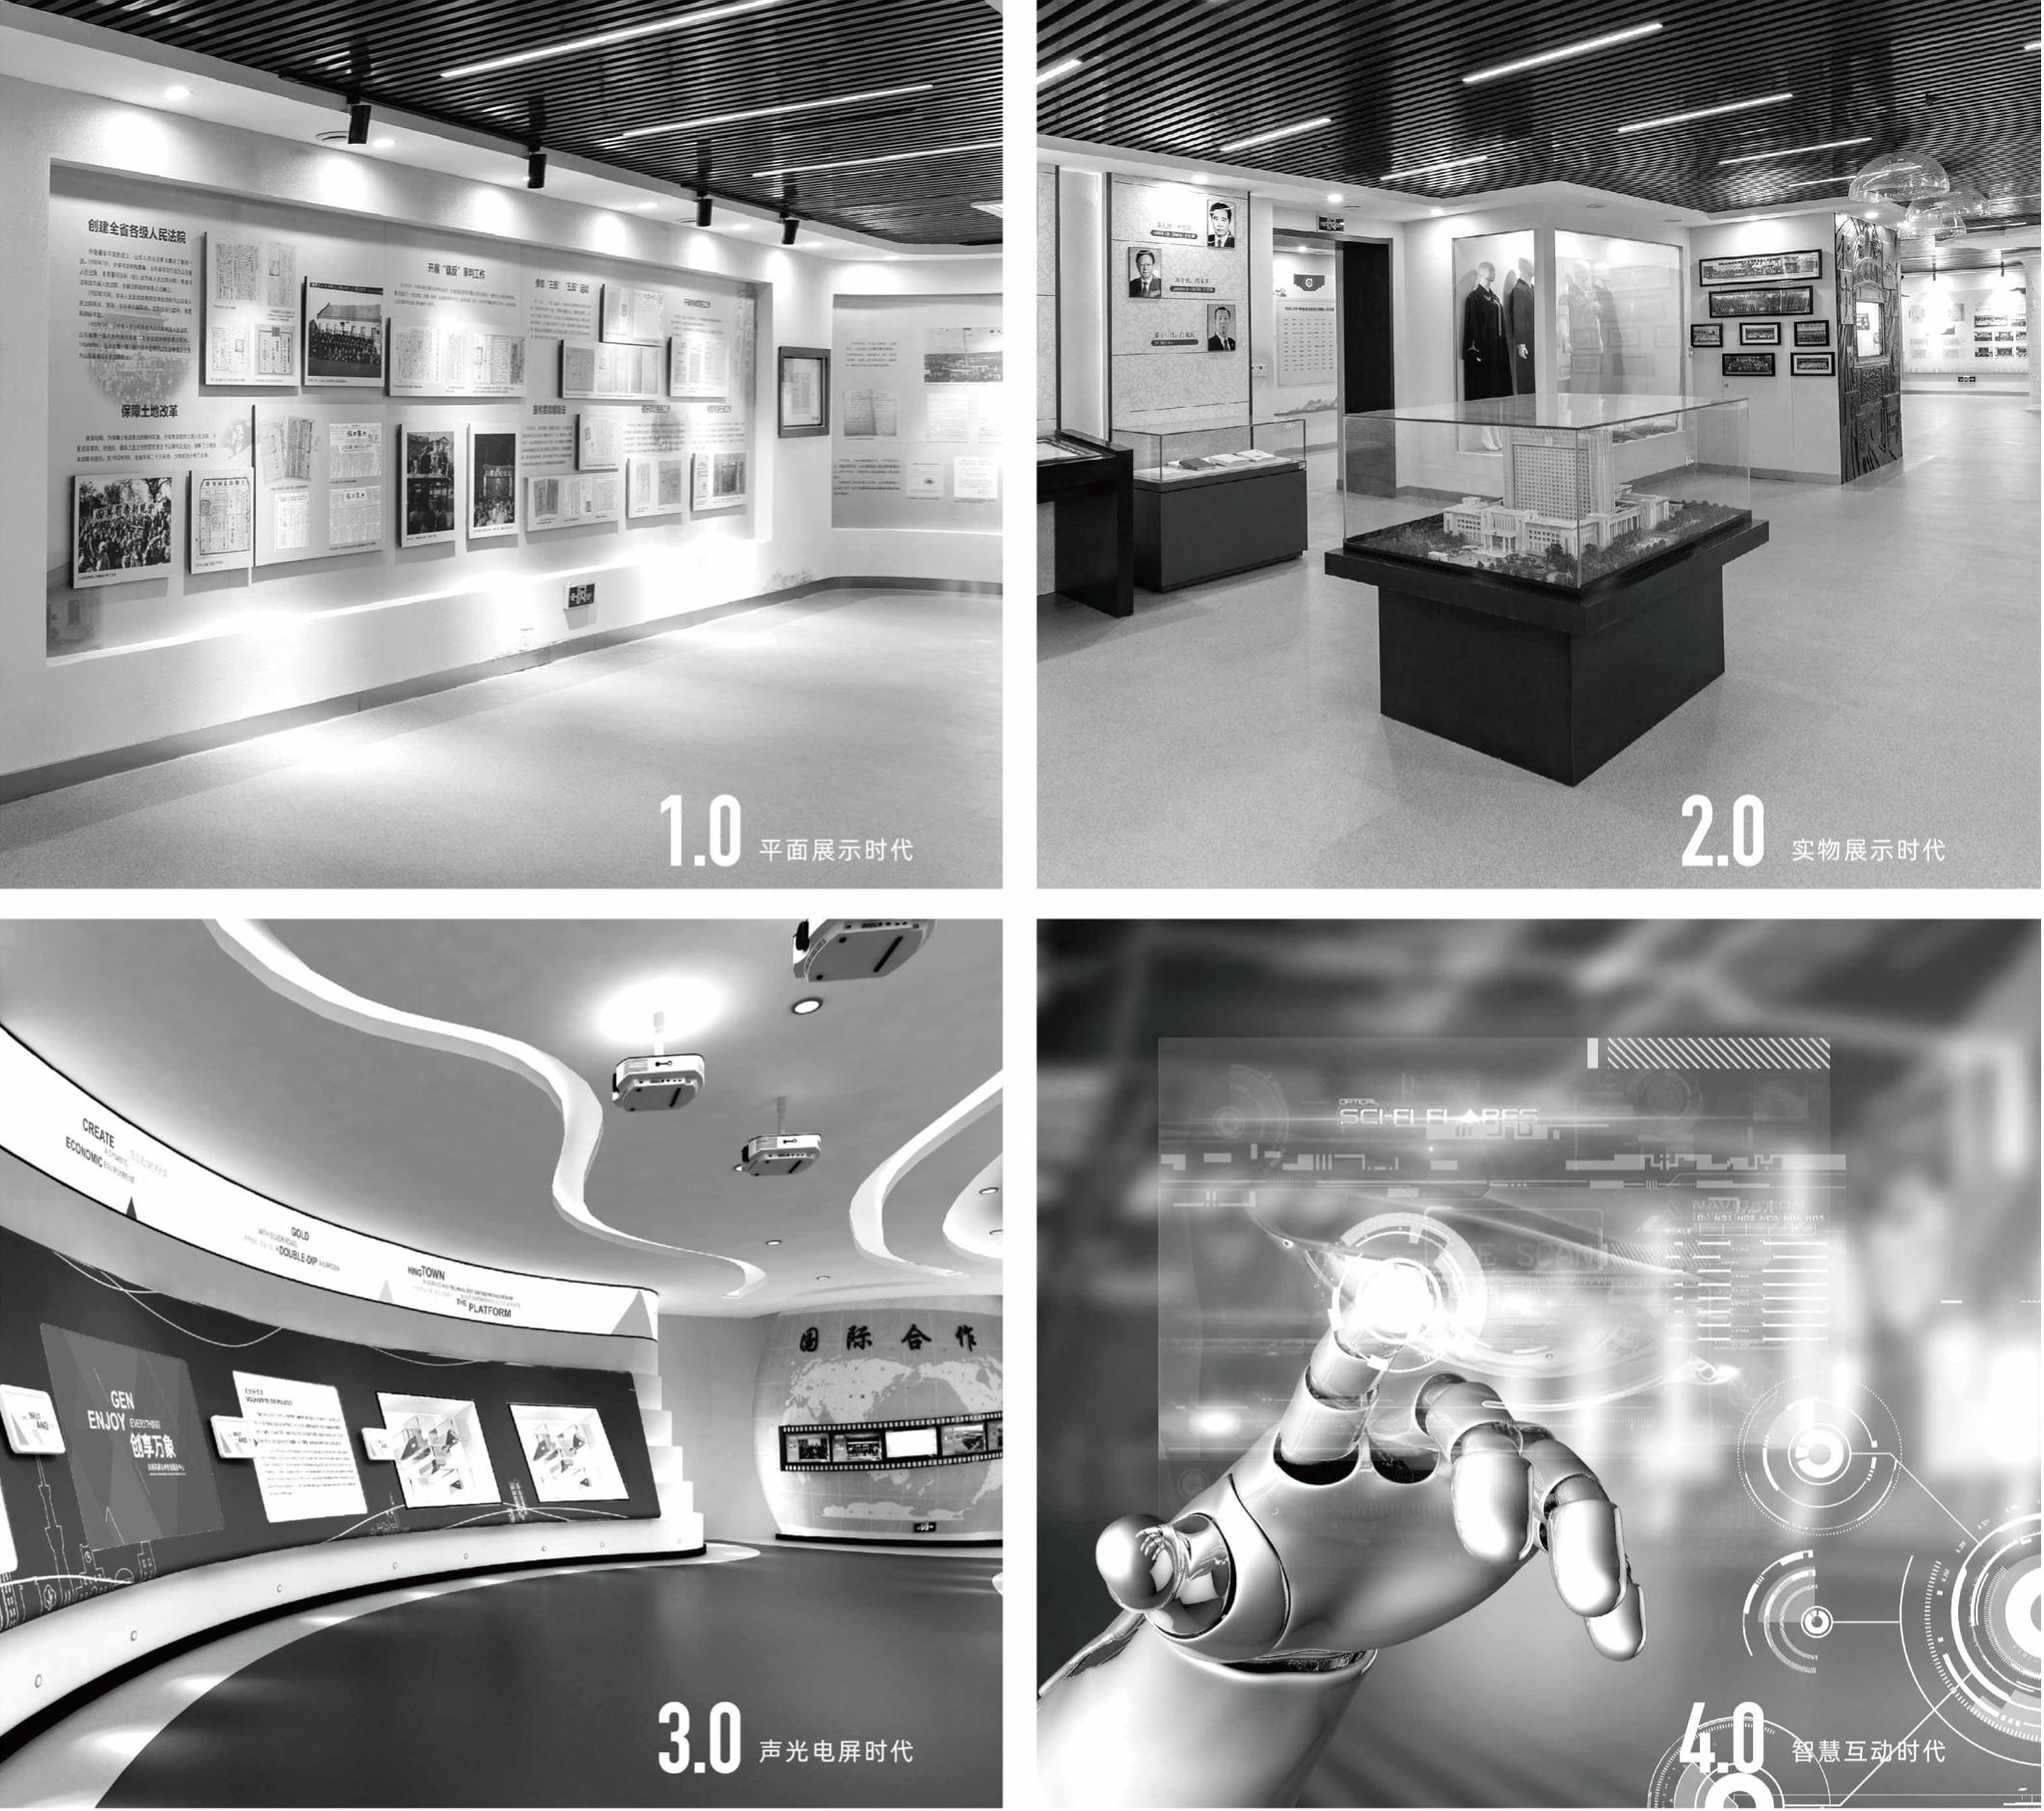 betway必威官网登陆下载半年推出9个展馆设计施工专利标准指南,得到全国展馆设计界高度称赞和广泛应用!